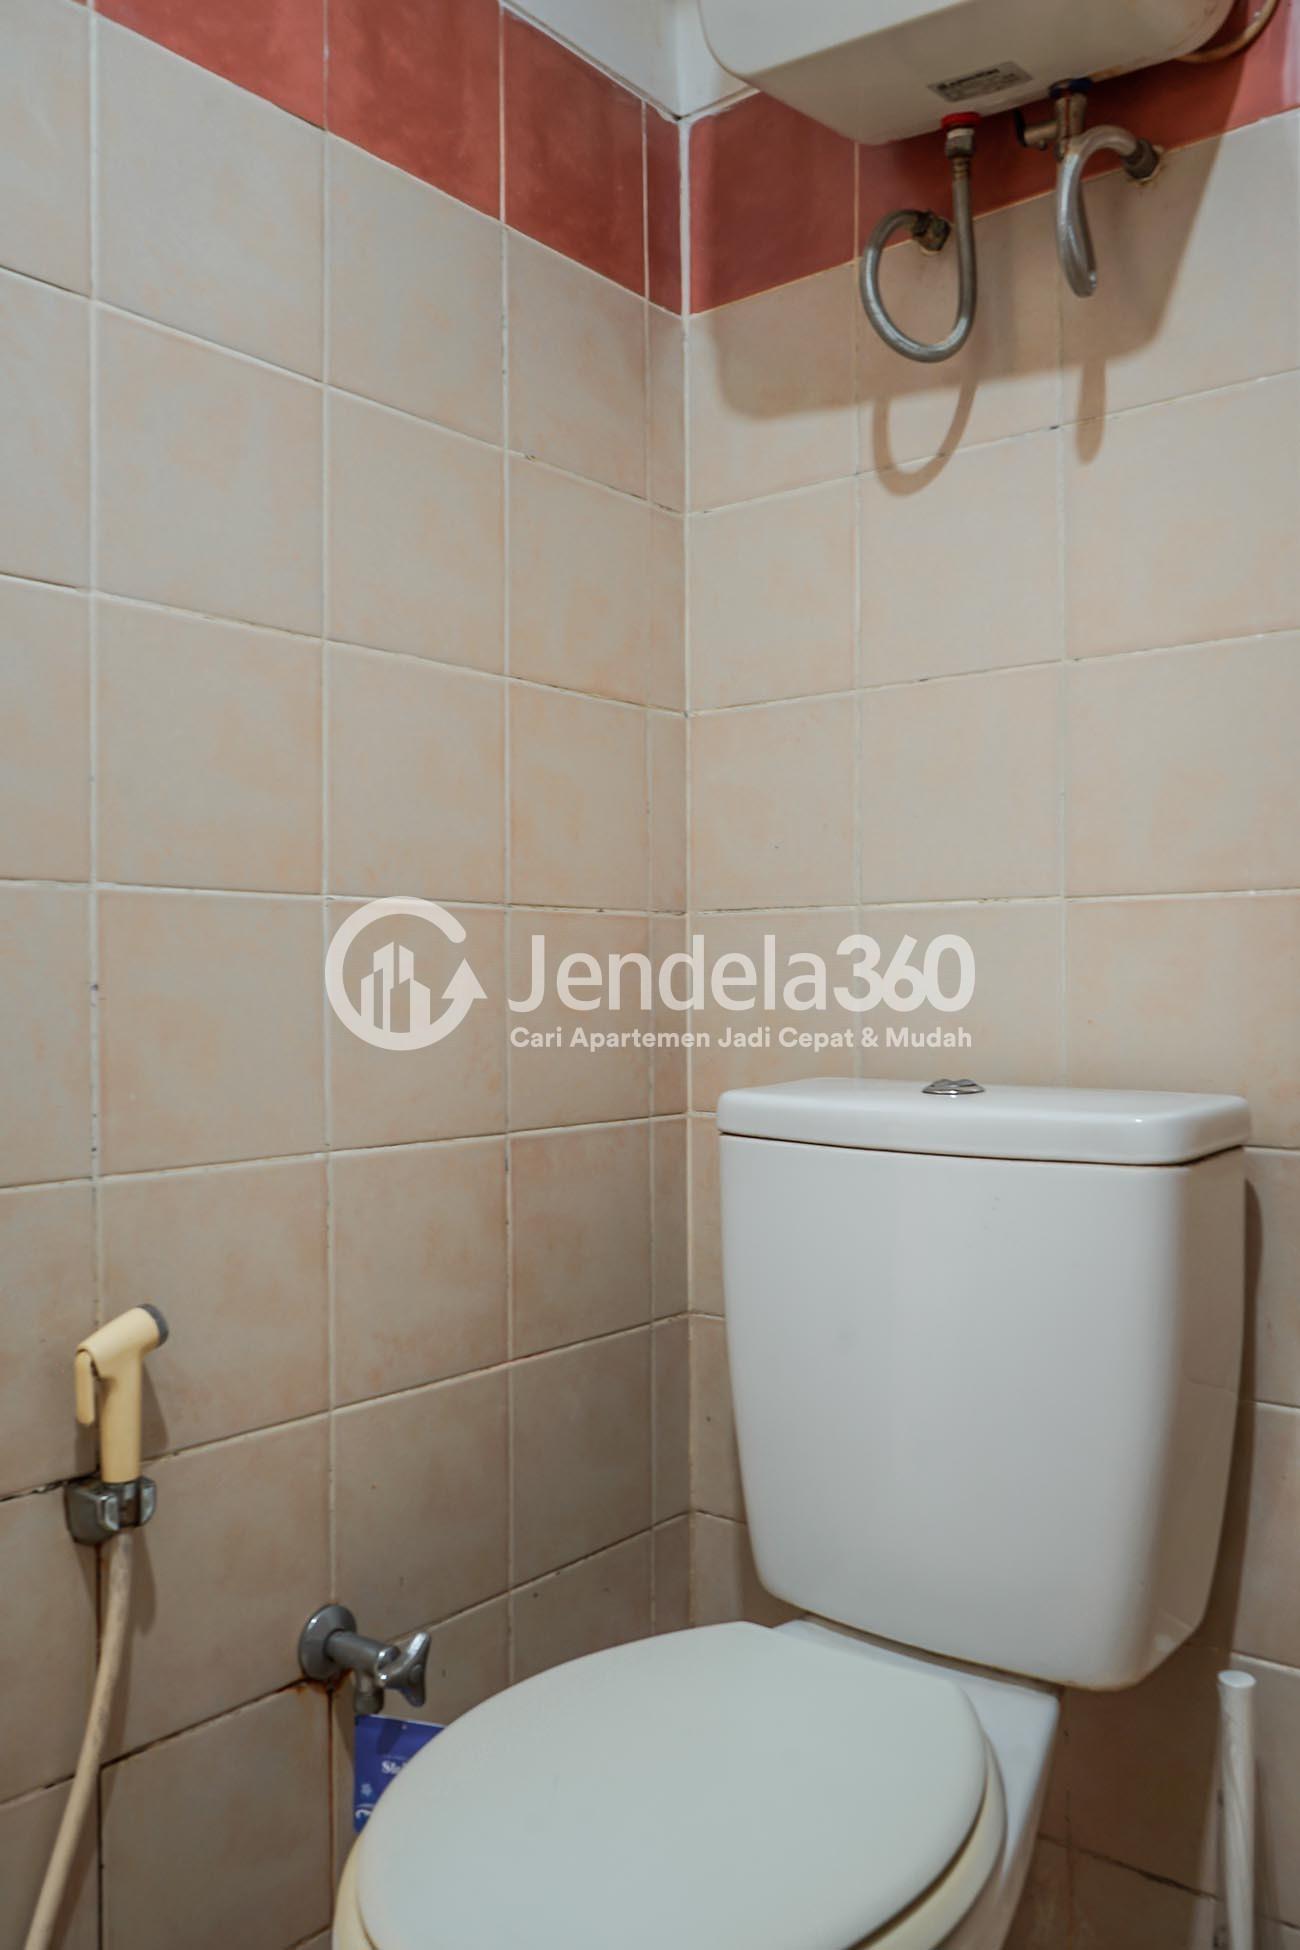 Bathroom Semanan Indah Apartment